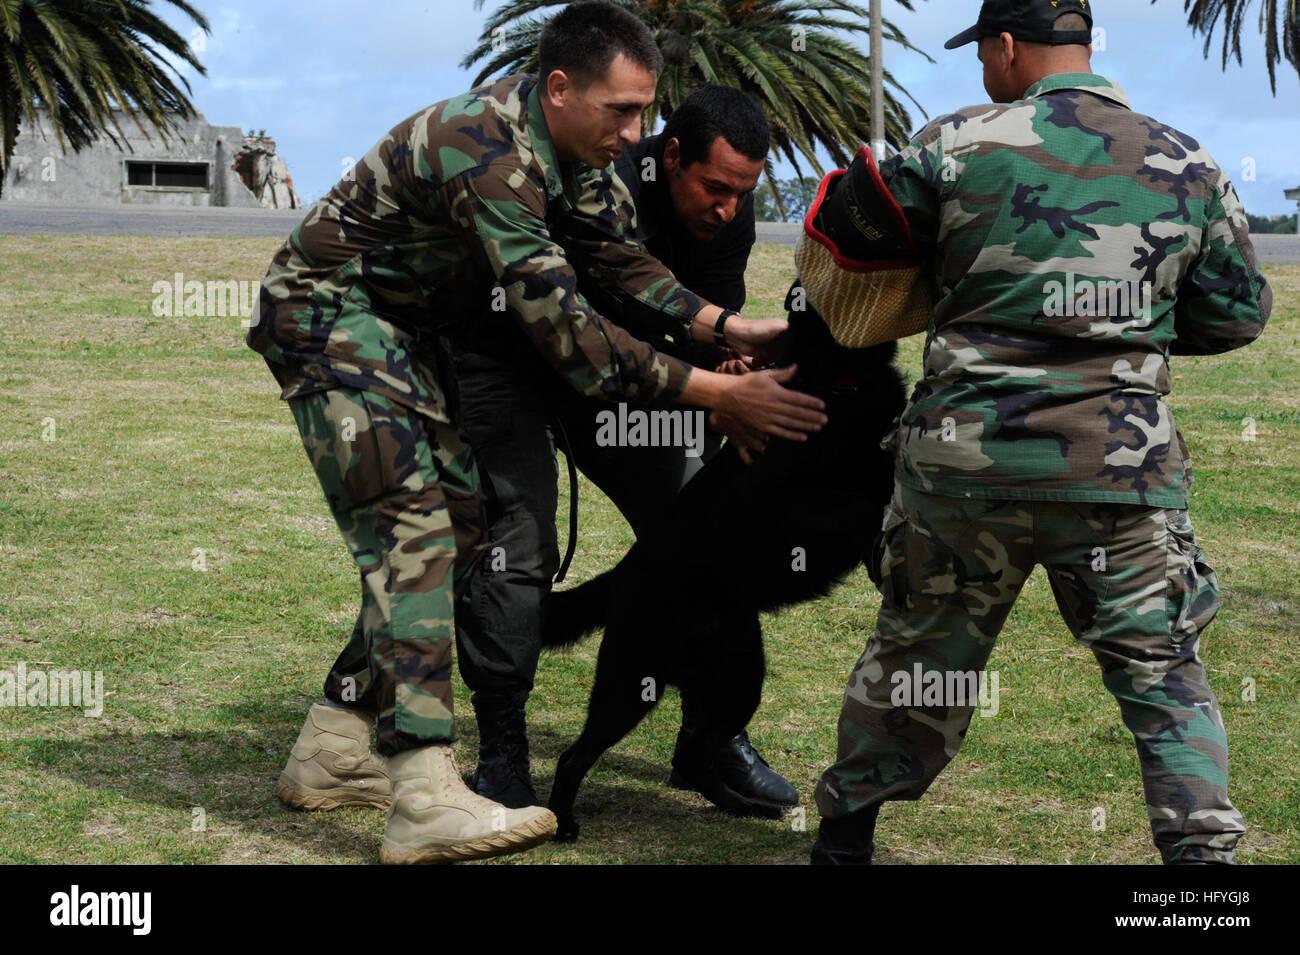 101117-N-8546L-088  MONTEVIDEO, Uruguay (Nov. 17, 2010) U.S. Navy Chief Master-at-Arms Nick Estrada, left, a military Stock Photo